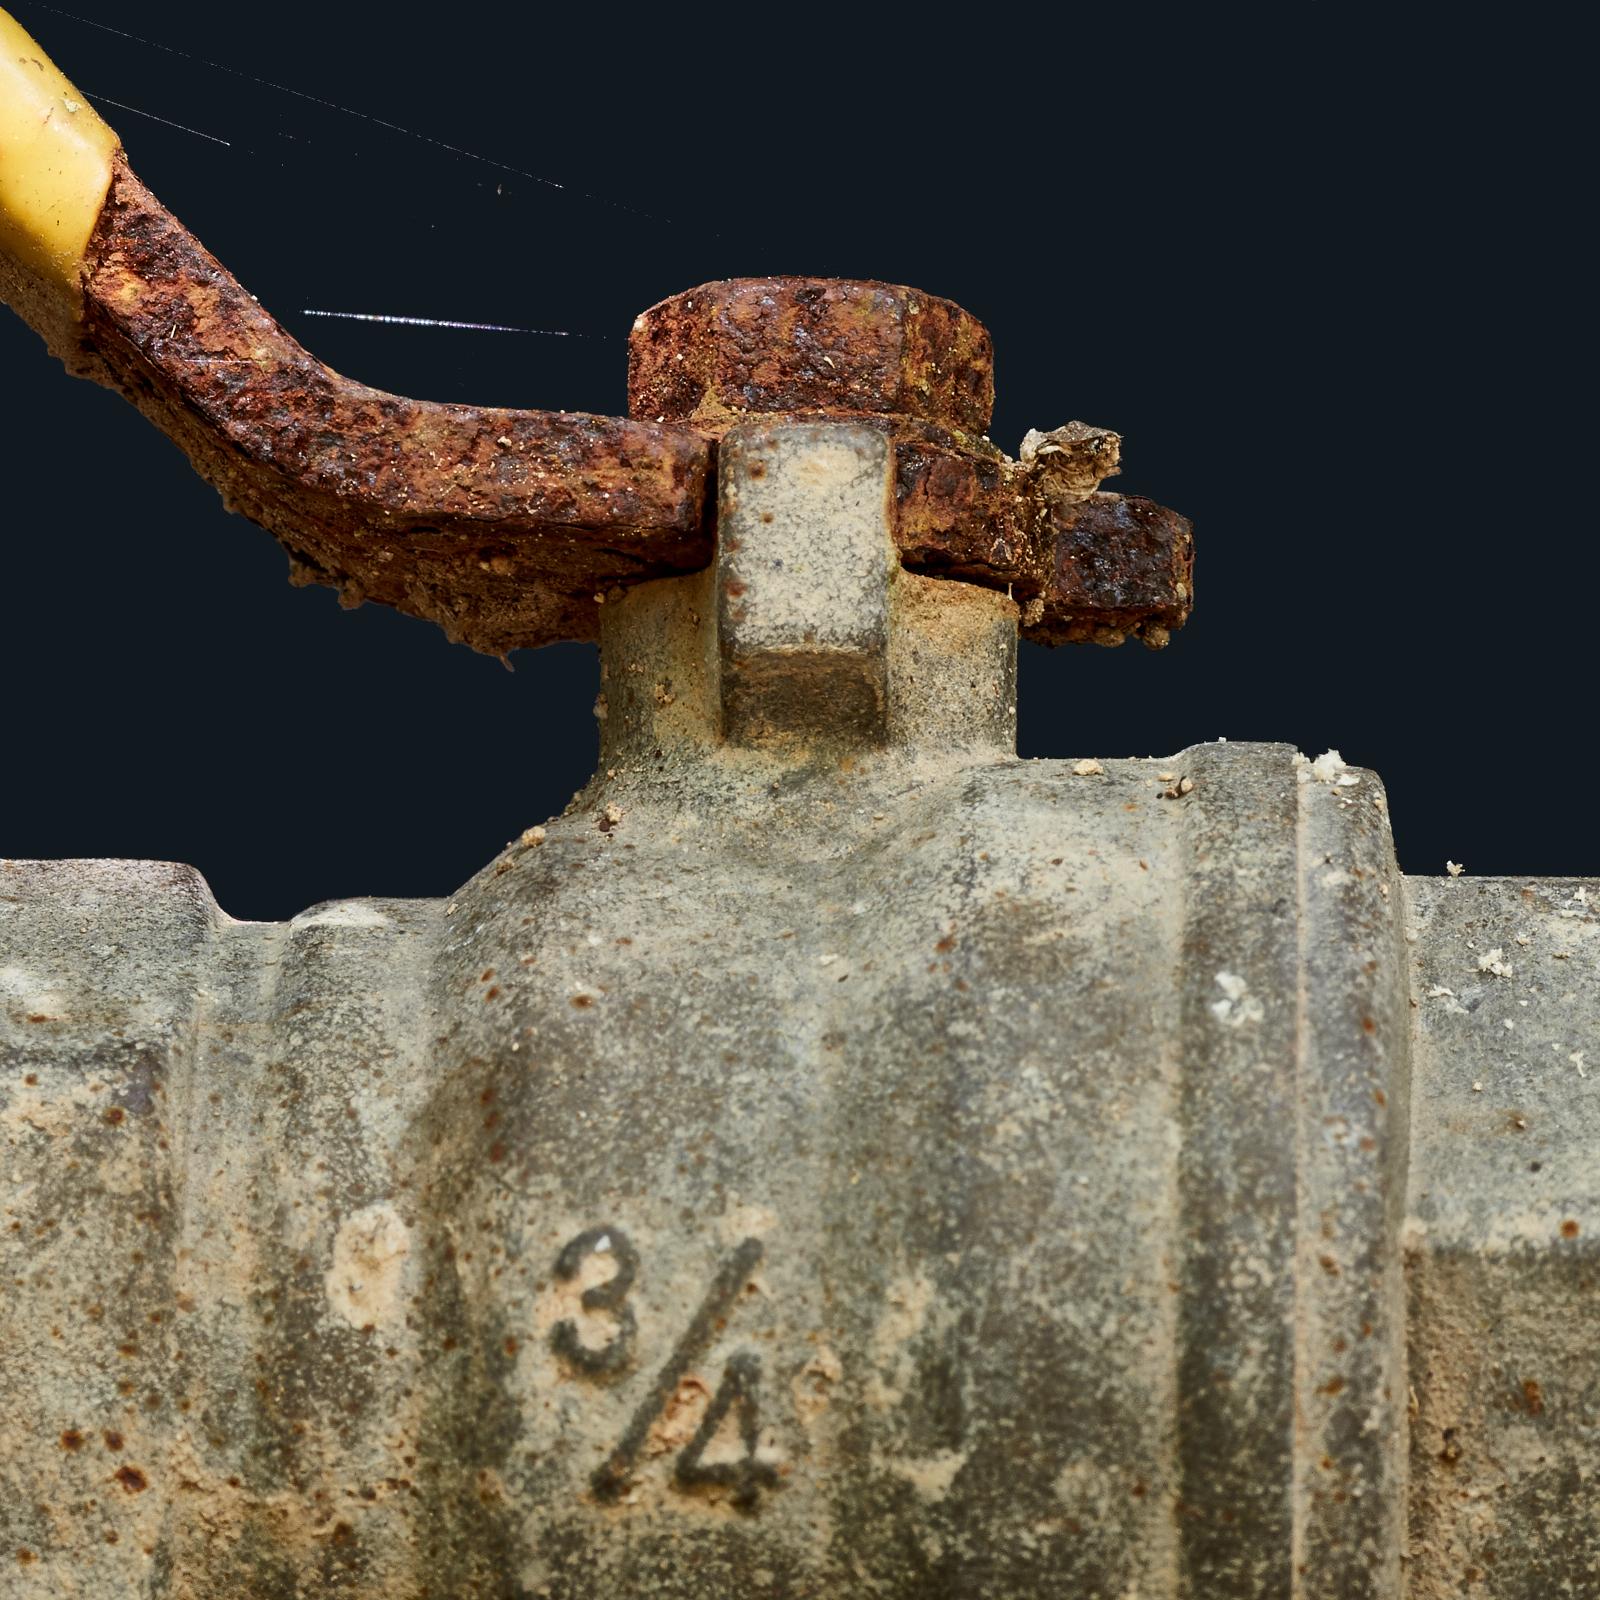 flow control valve,rusted,garden swtudio, Philippines